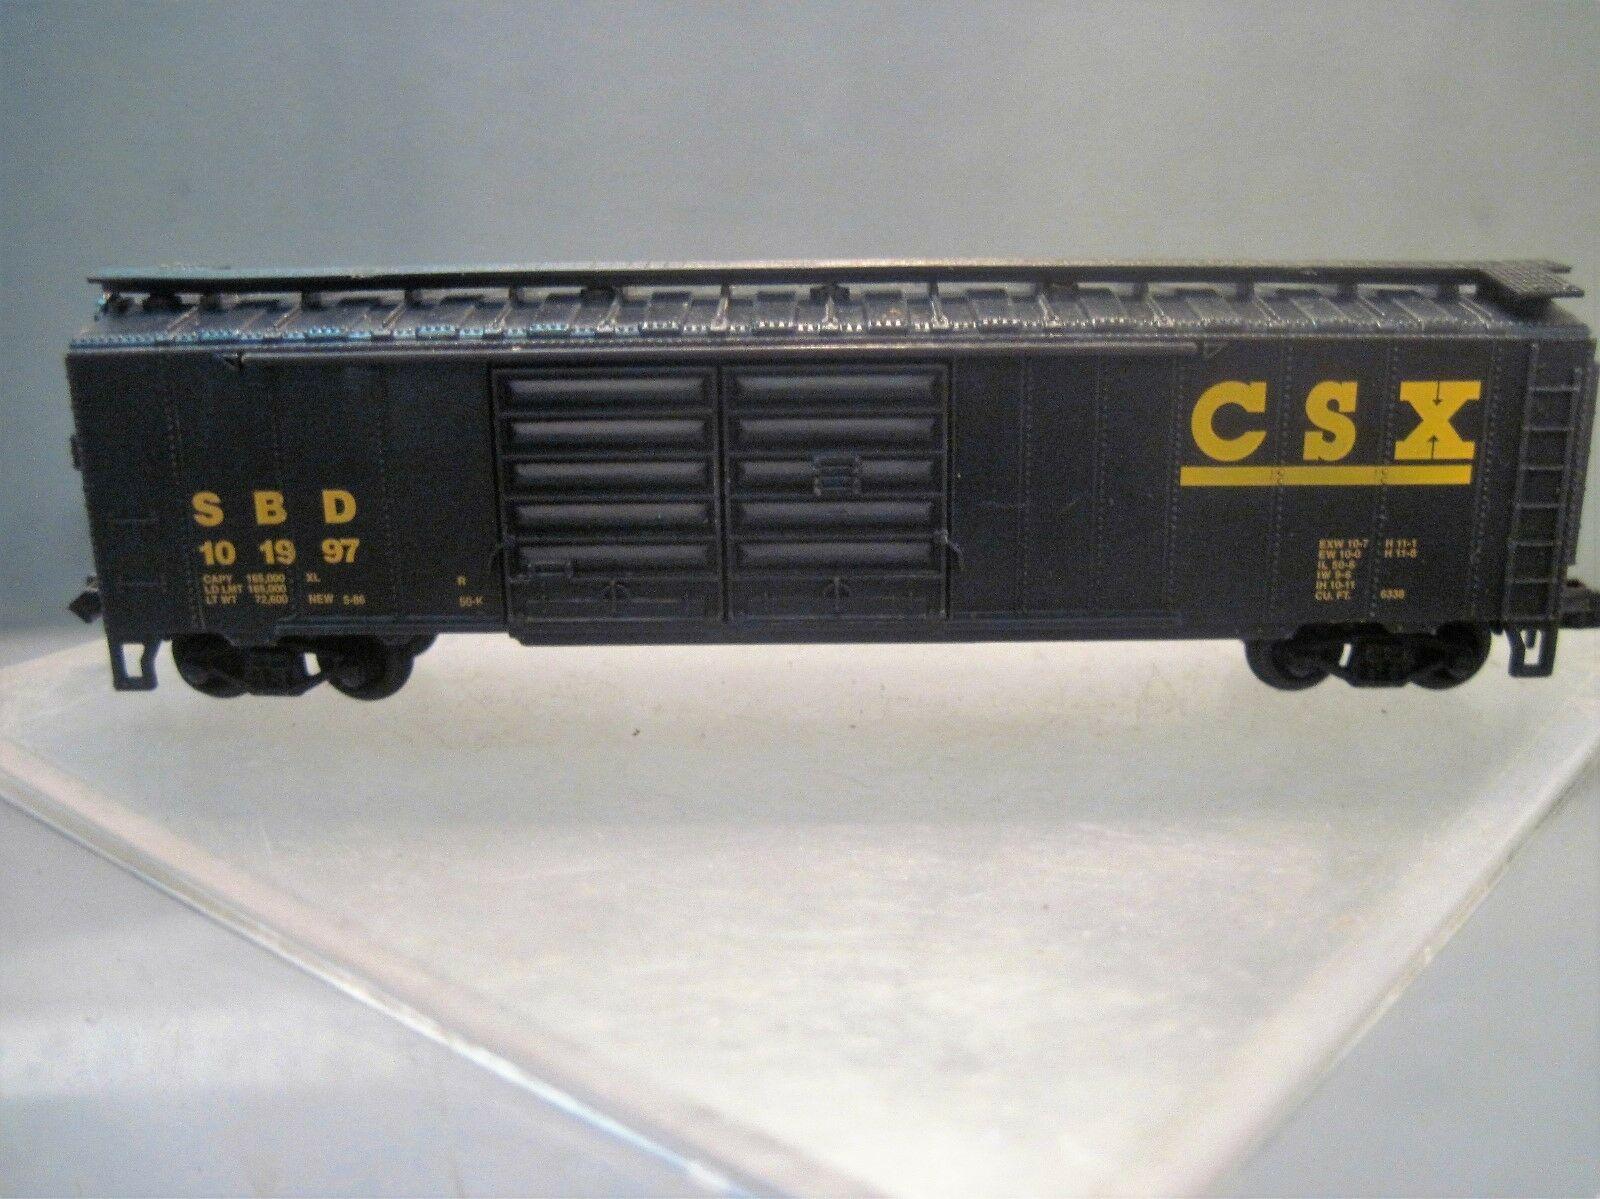 N Scale - Industrial Rail - 7793DDCSX - Boxcar, 50 Foot, Steel, Double Door - CSX Transportation - 101997